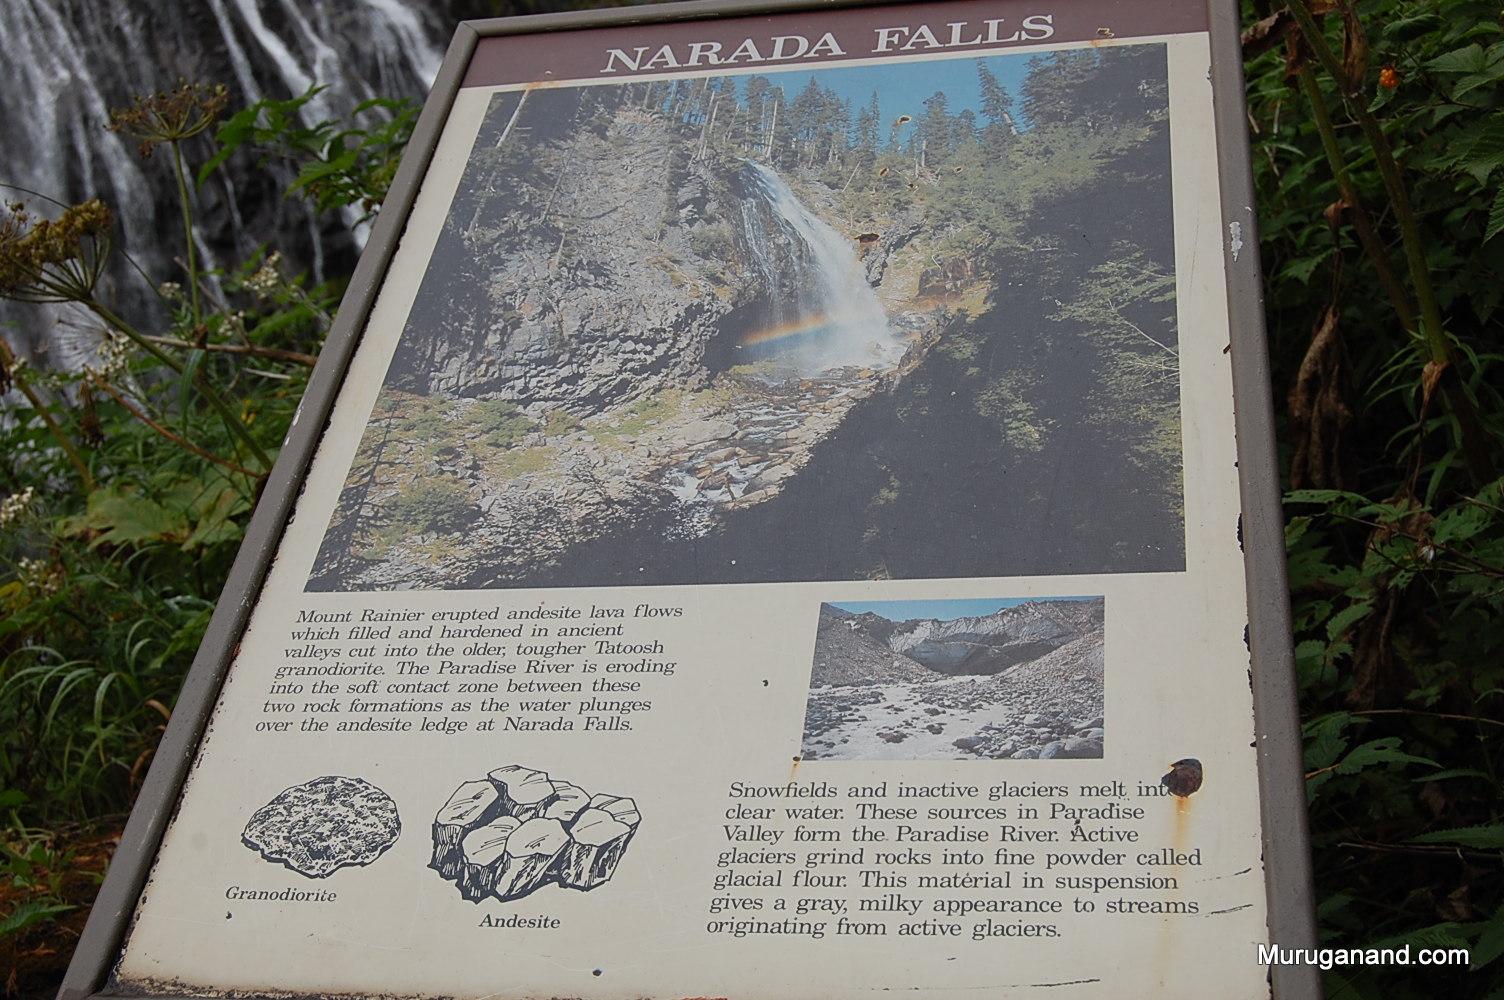 For a hindu, Narada name sounds familiar